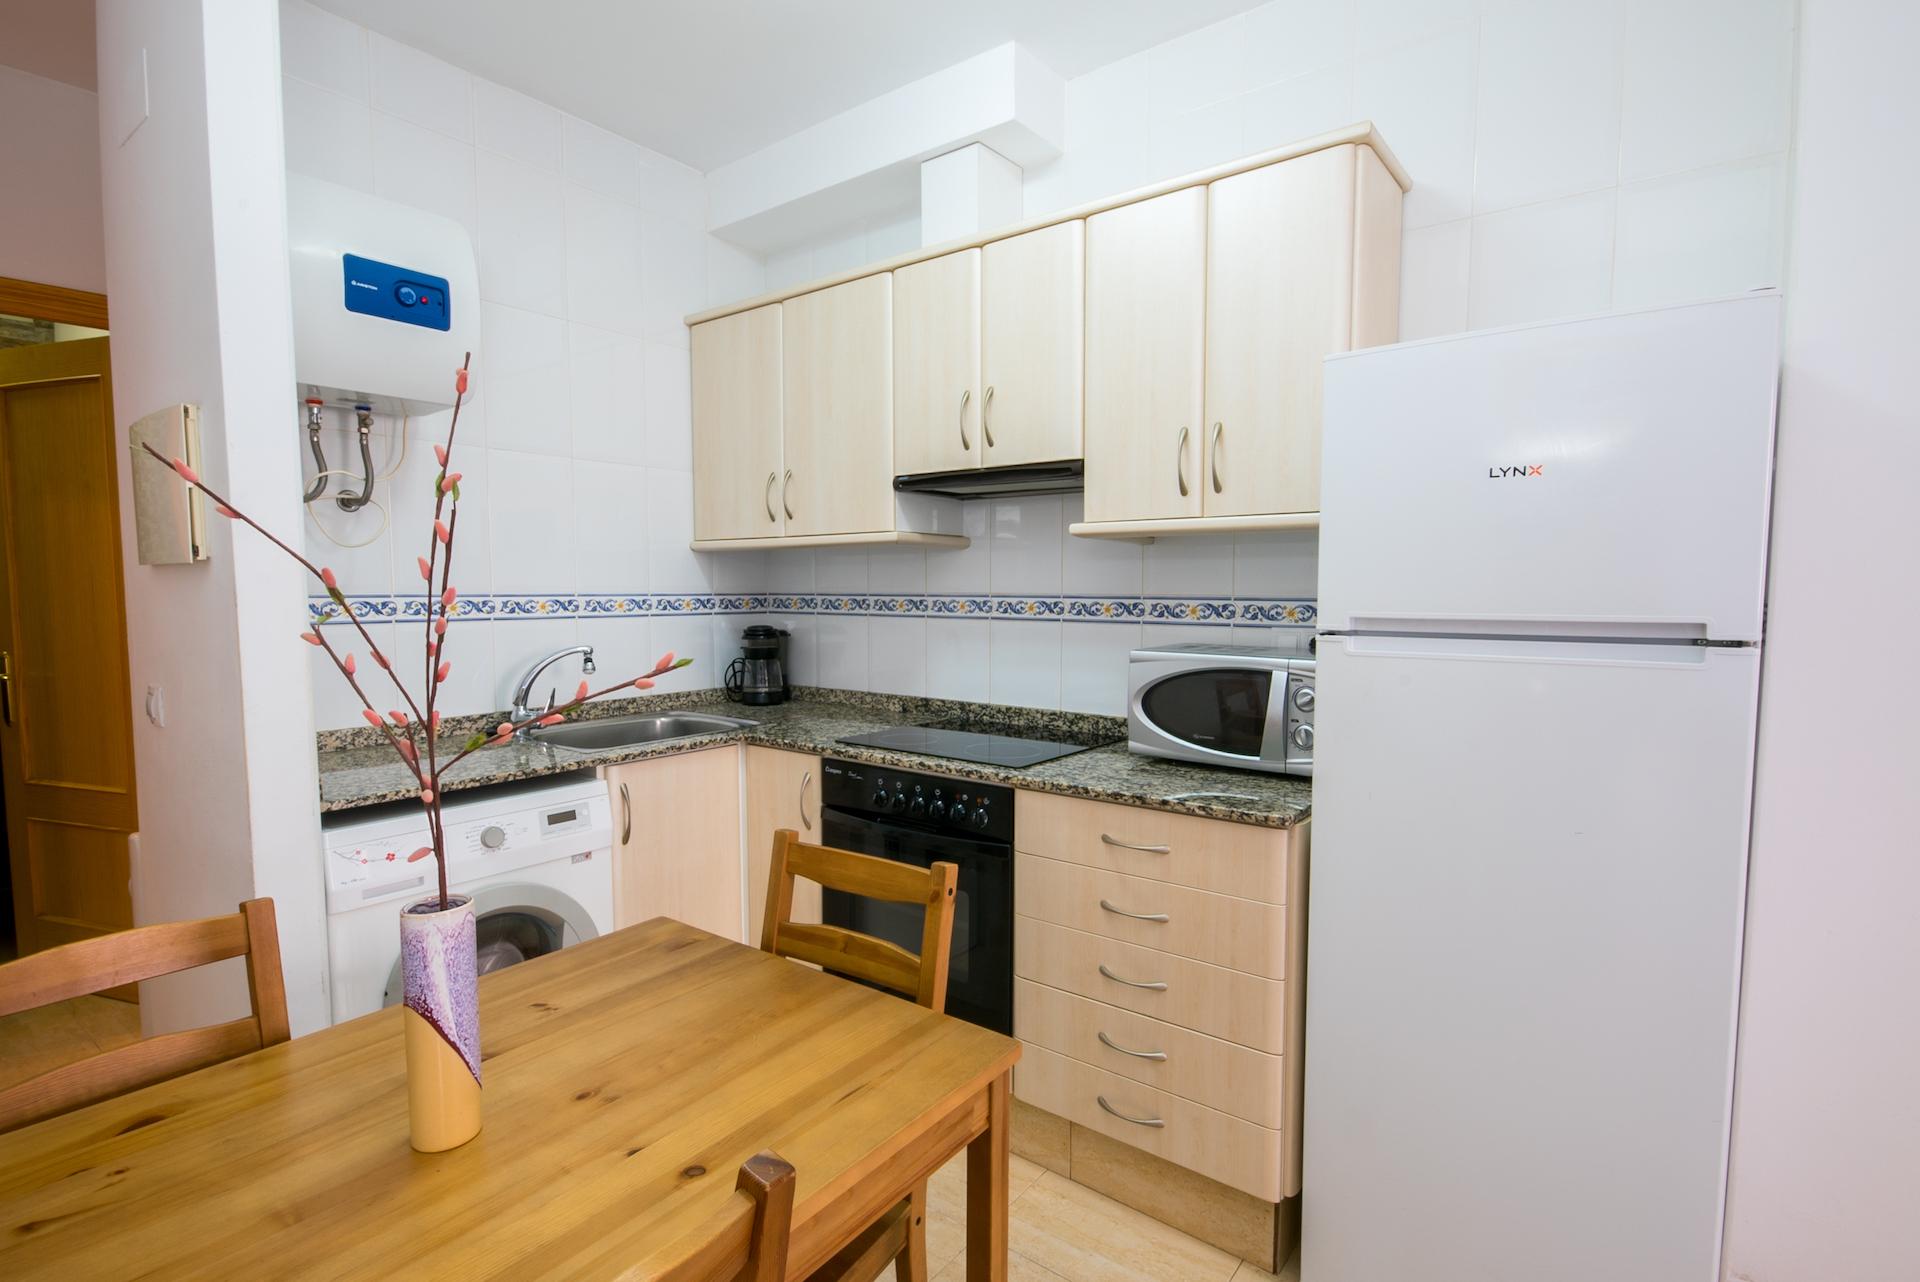 Apartamento Benafer Planta Baja - Cocina